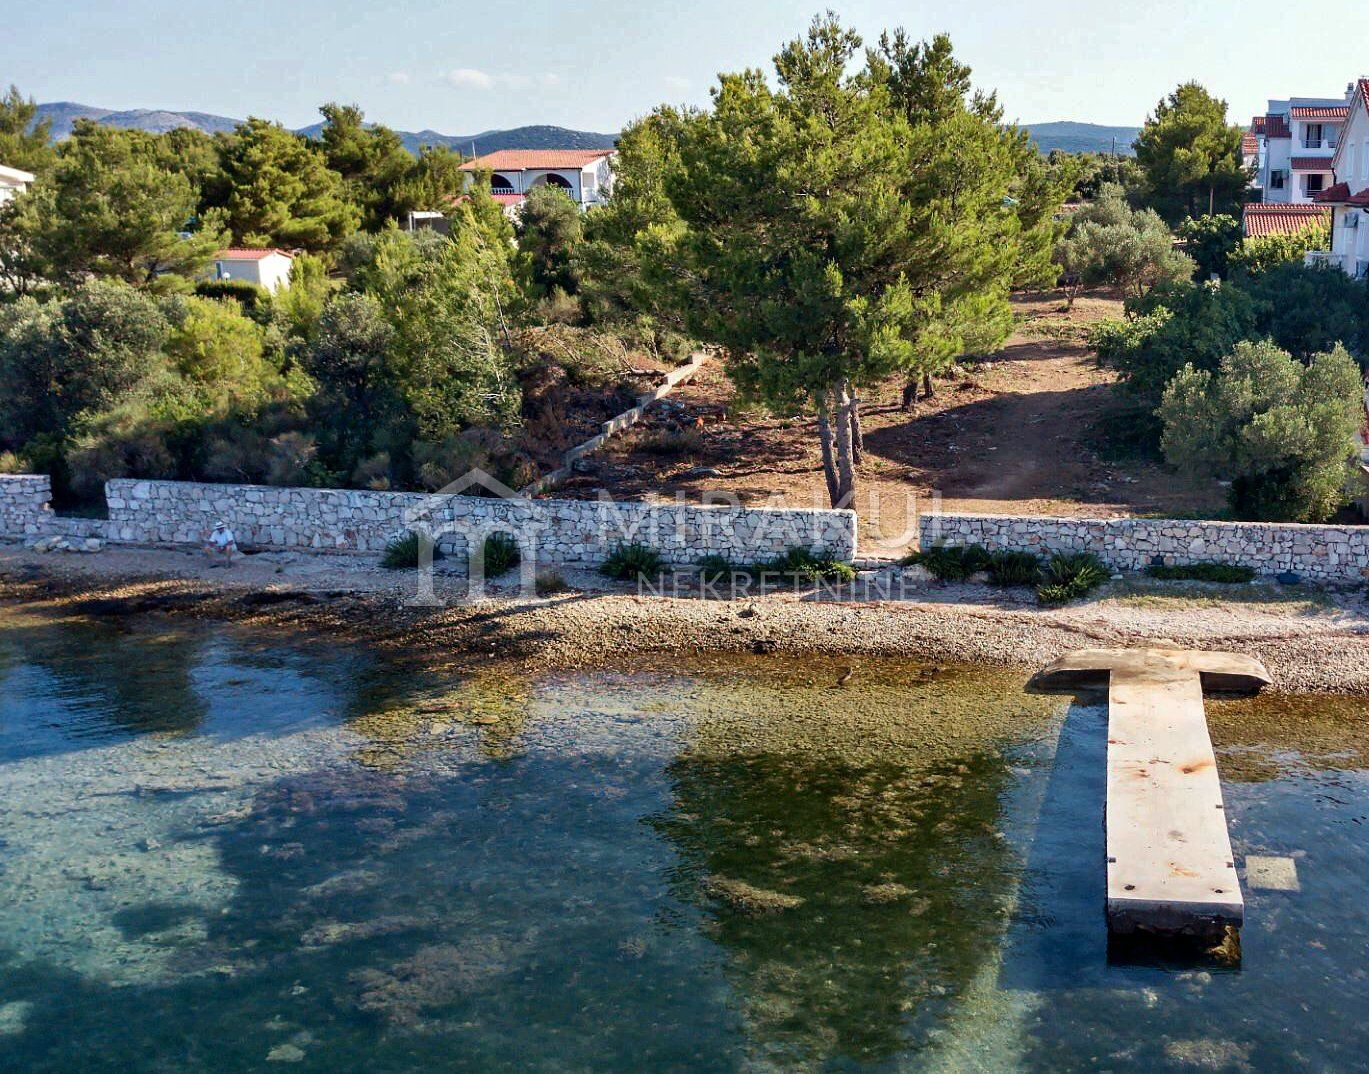 Immobilien Pirovac Kroatien, Land, Mirakul Immobilienagentur, ID - GP-338, Baugrundstück in erster Reihe zum Meer 1